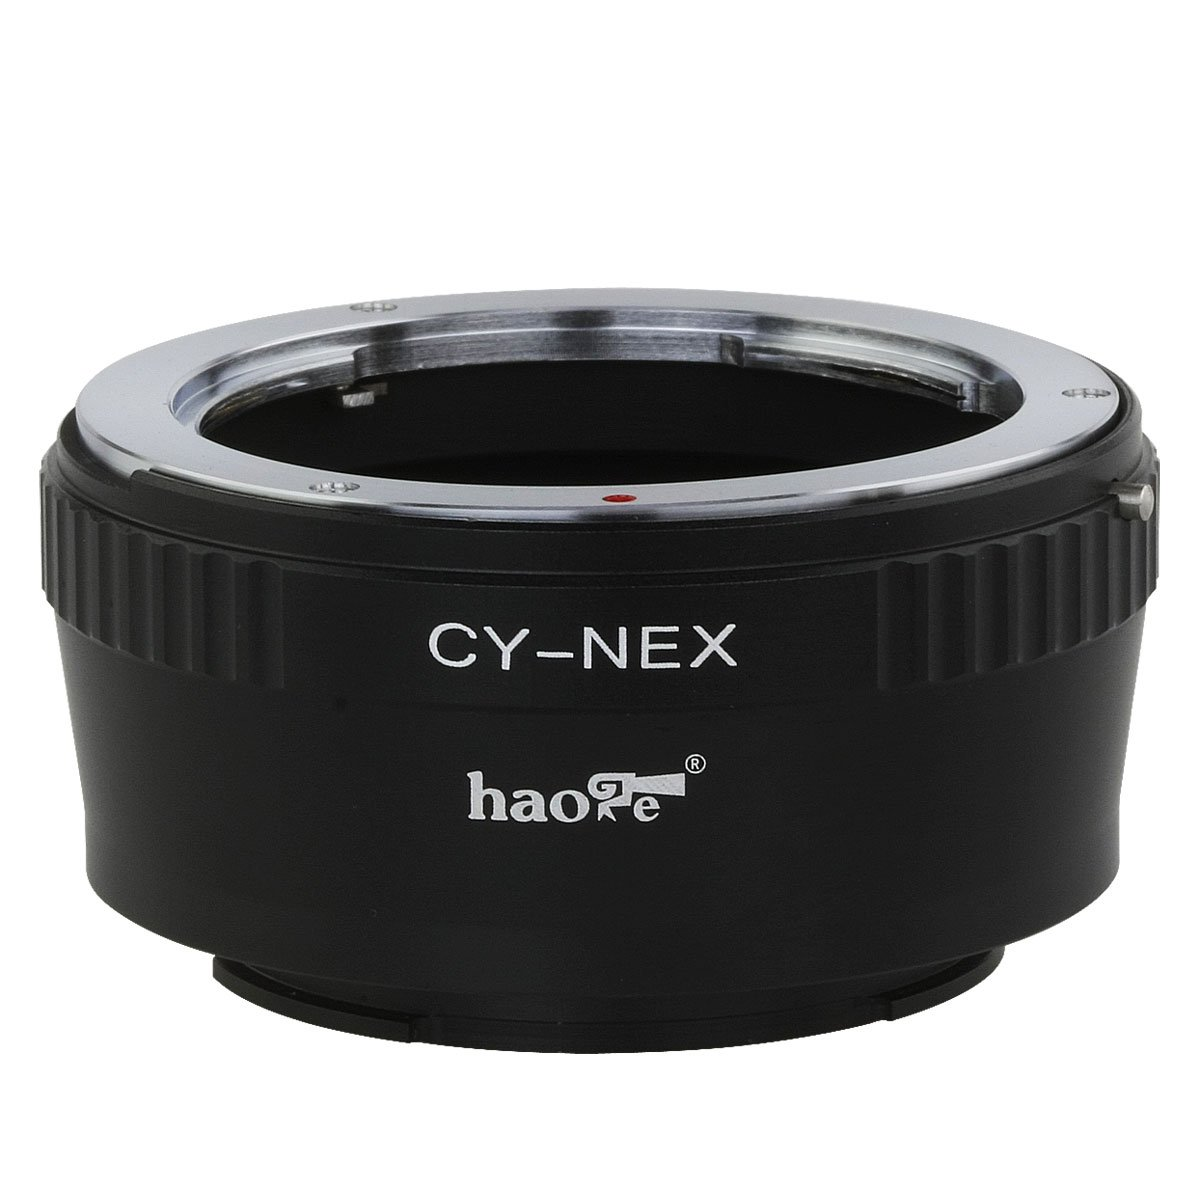 NEX-C3 a6500 a6300 NEX-5N a5000 NEX-5 a3000 NEX-7N NEX-F3 Haoge Lens Mount Adapter for Contax Yashica C//Y CY Mount Lens to Sony E mount NEX Camera as NEX-3 VG20 NEX-7 a3500 a6000 NEX-VG10